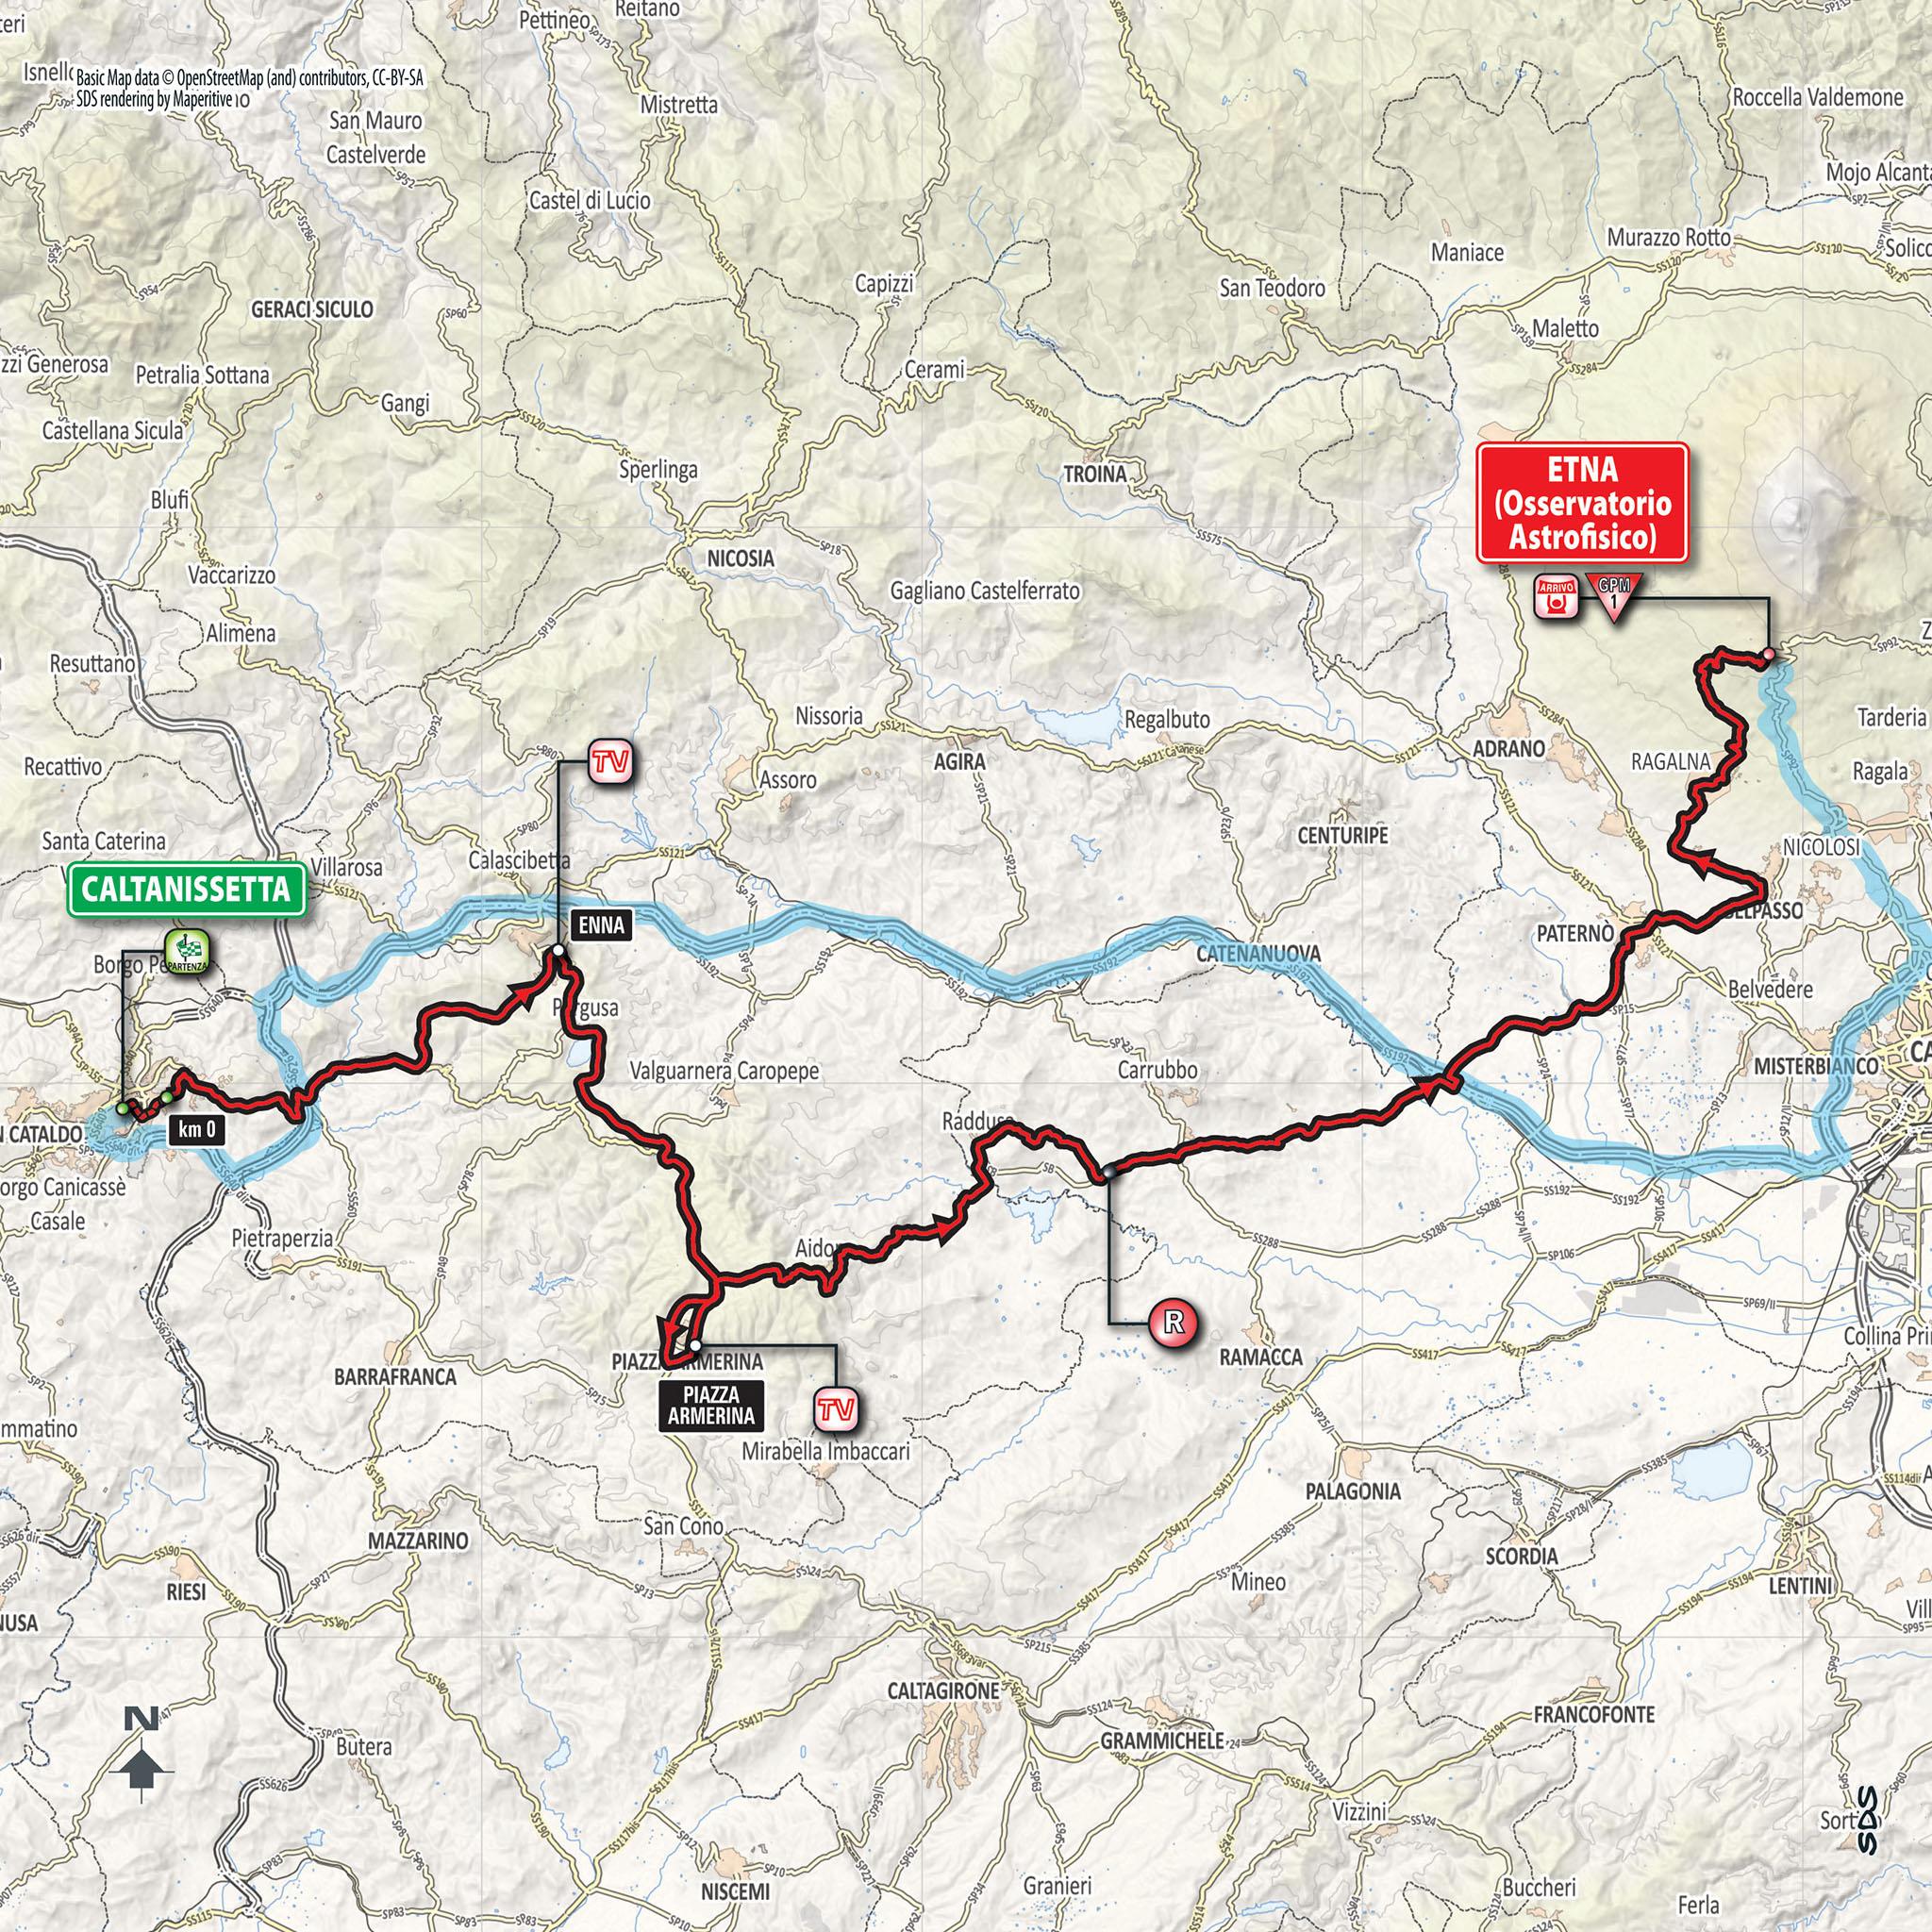 Parcours étape 6 Giro 2018